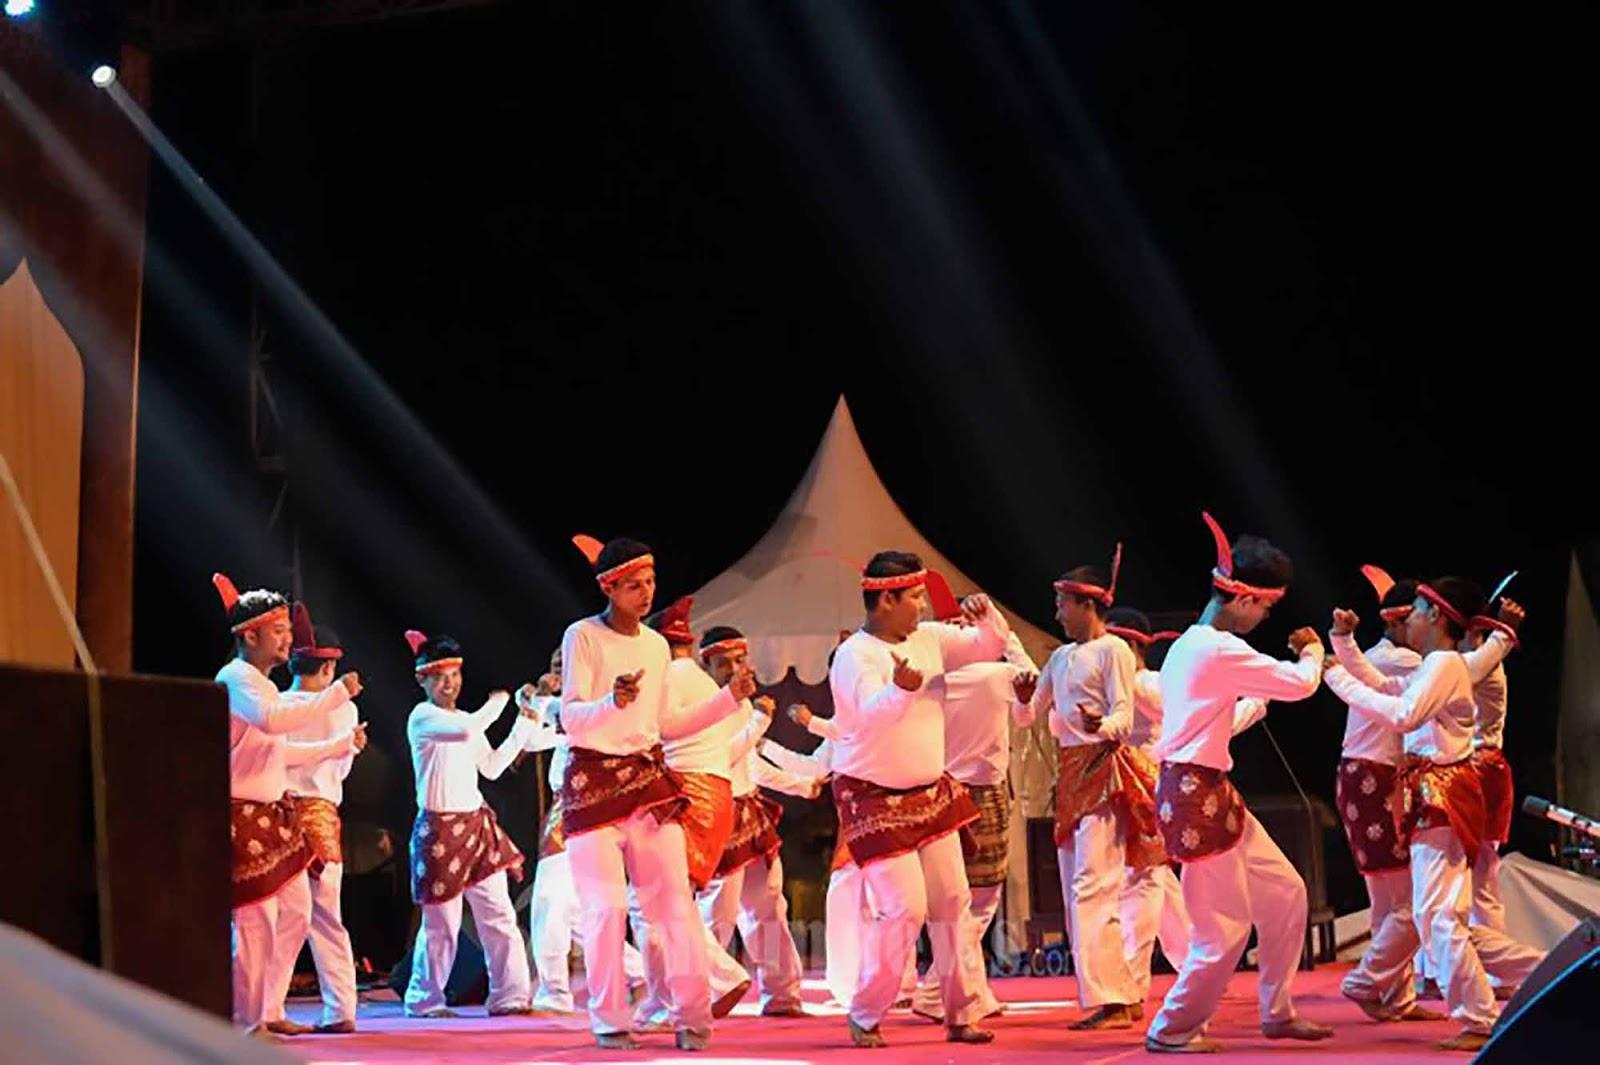 Tari Seudati Tarian Tradisional Aceh  Kamera Budaya